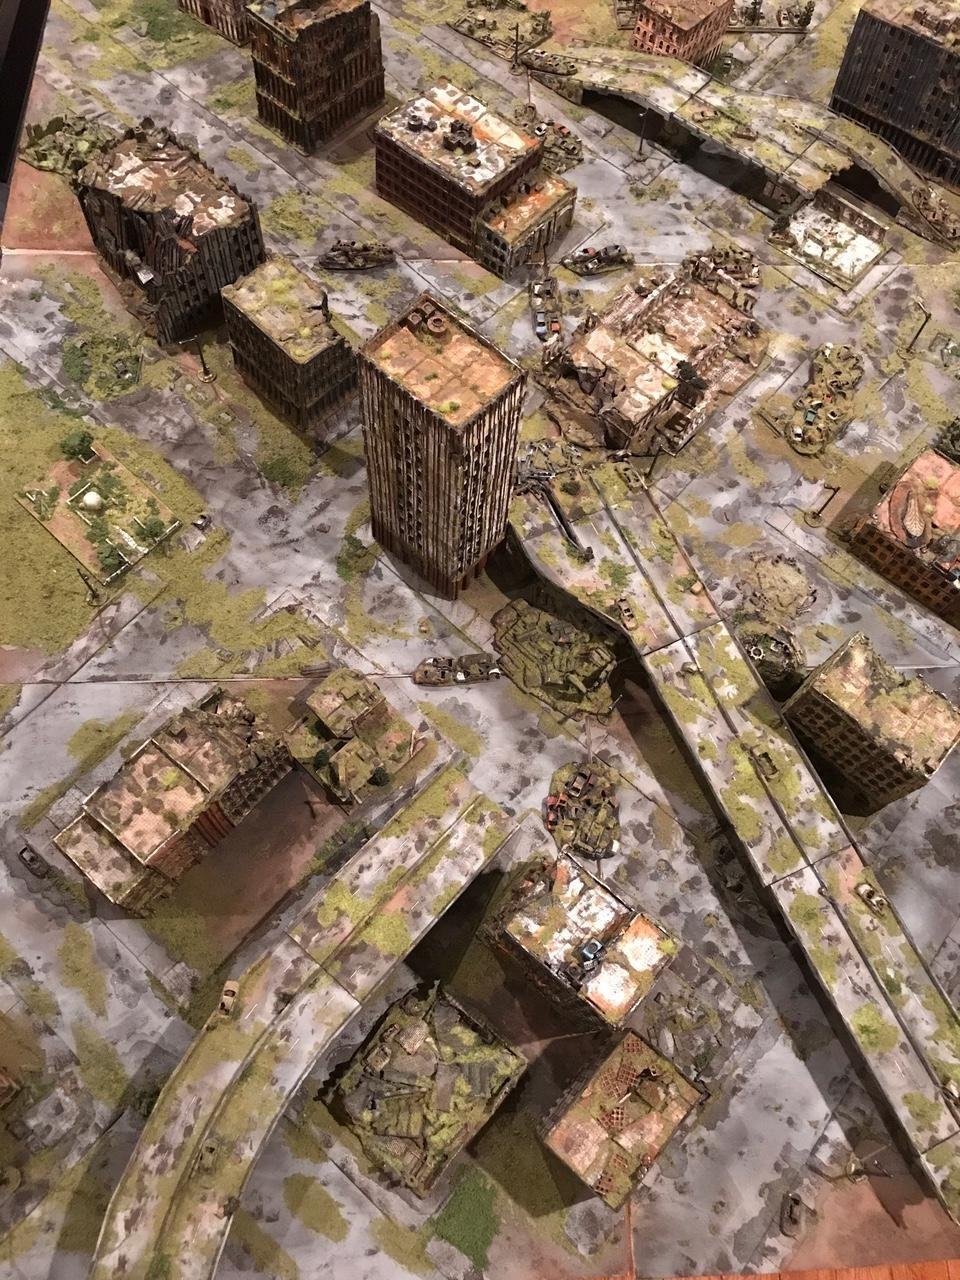 My Masterpiece As A Hobbyist My 5x4 City Table N Scale 10mm Forum Dakkadakka Wargaming Terrain Warhammer Terrain Overgrown City